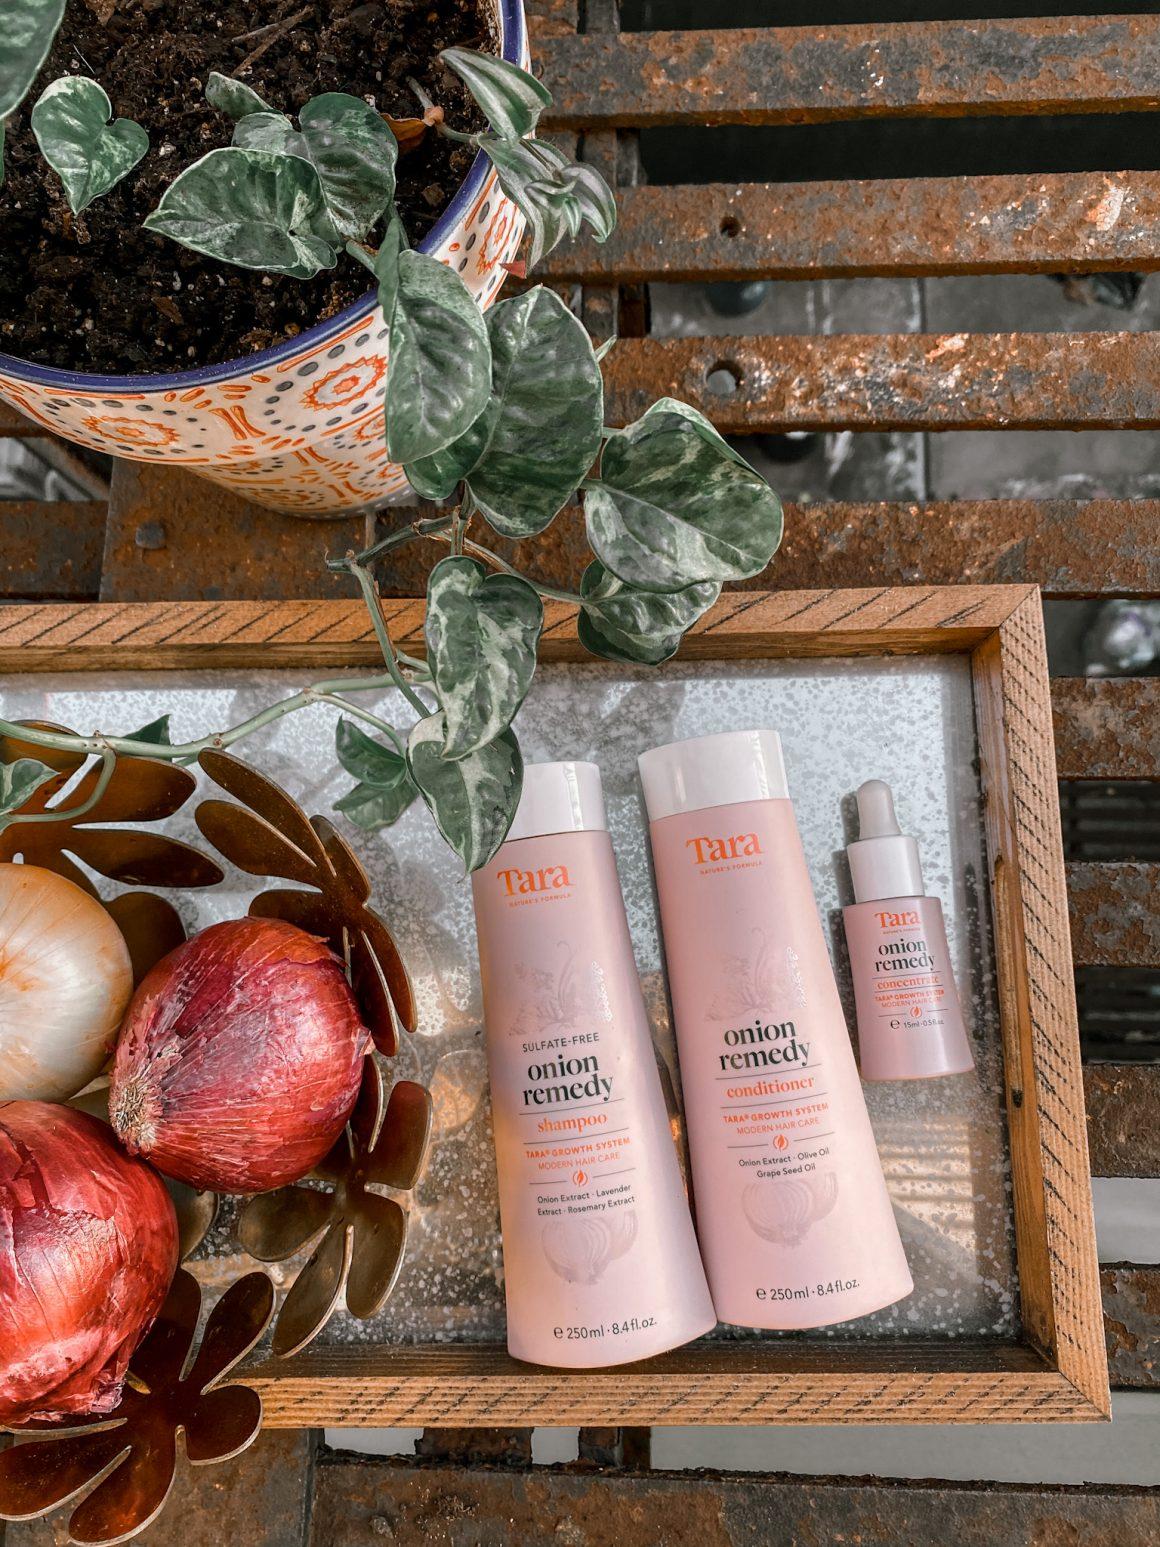 Tara Nature's Formula Onion Remedy System